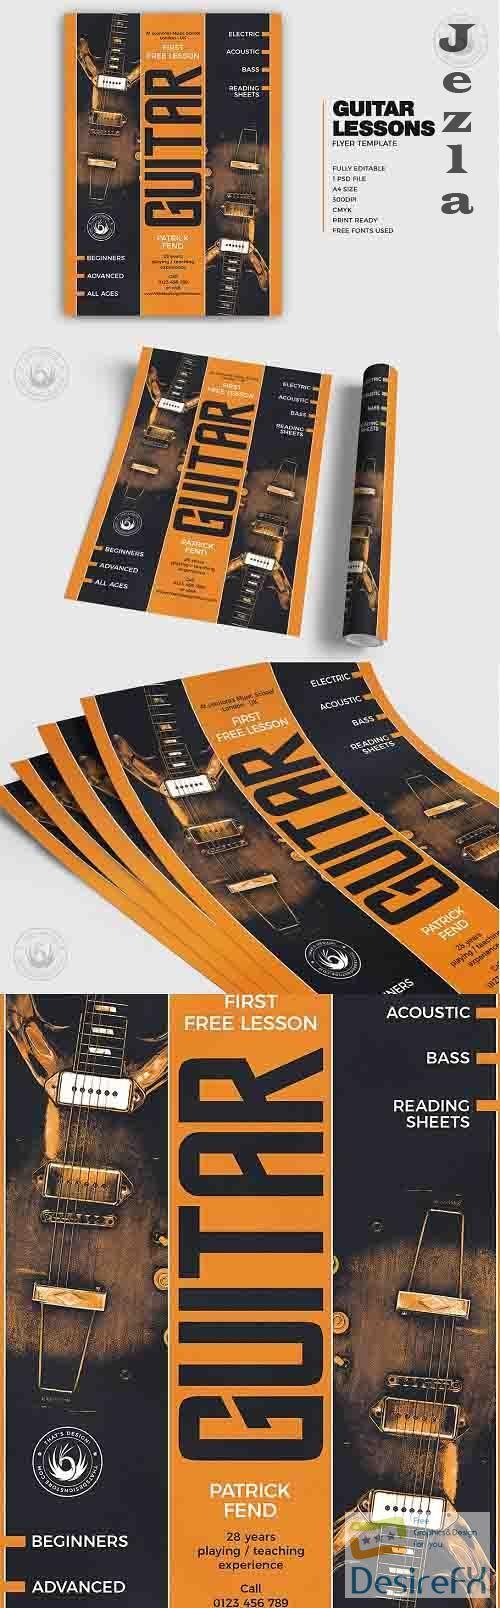 Guitar Lessons Flyer Template V6 - 524517